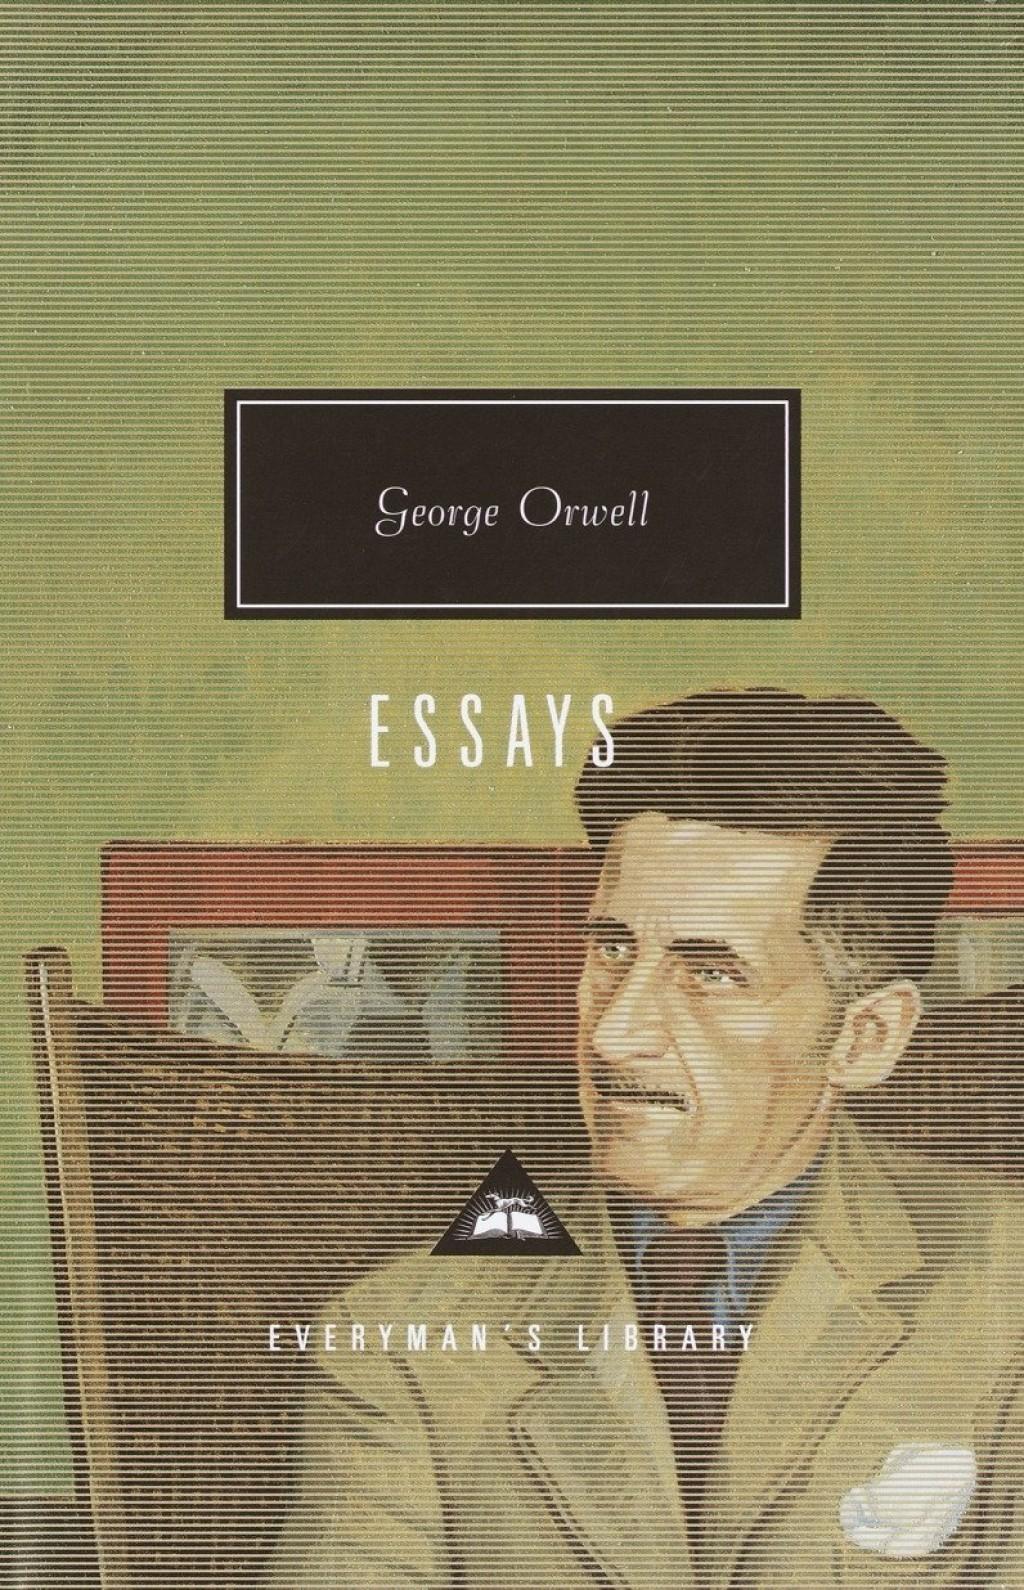 006 81qzb0g1zol Essay Example George Orwell Frightening Essays Everyman's Library Summary Bookshop Memories Large